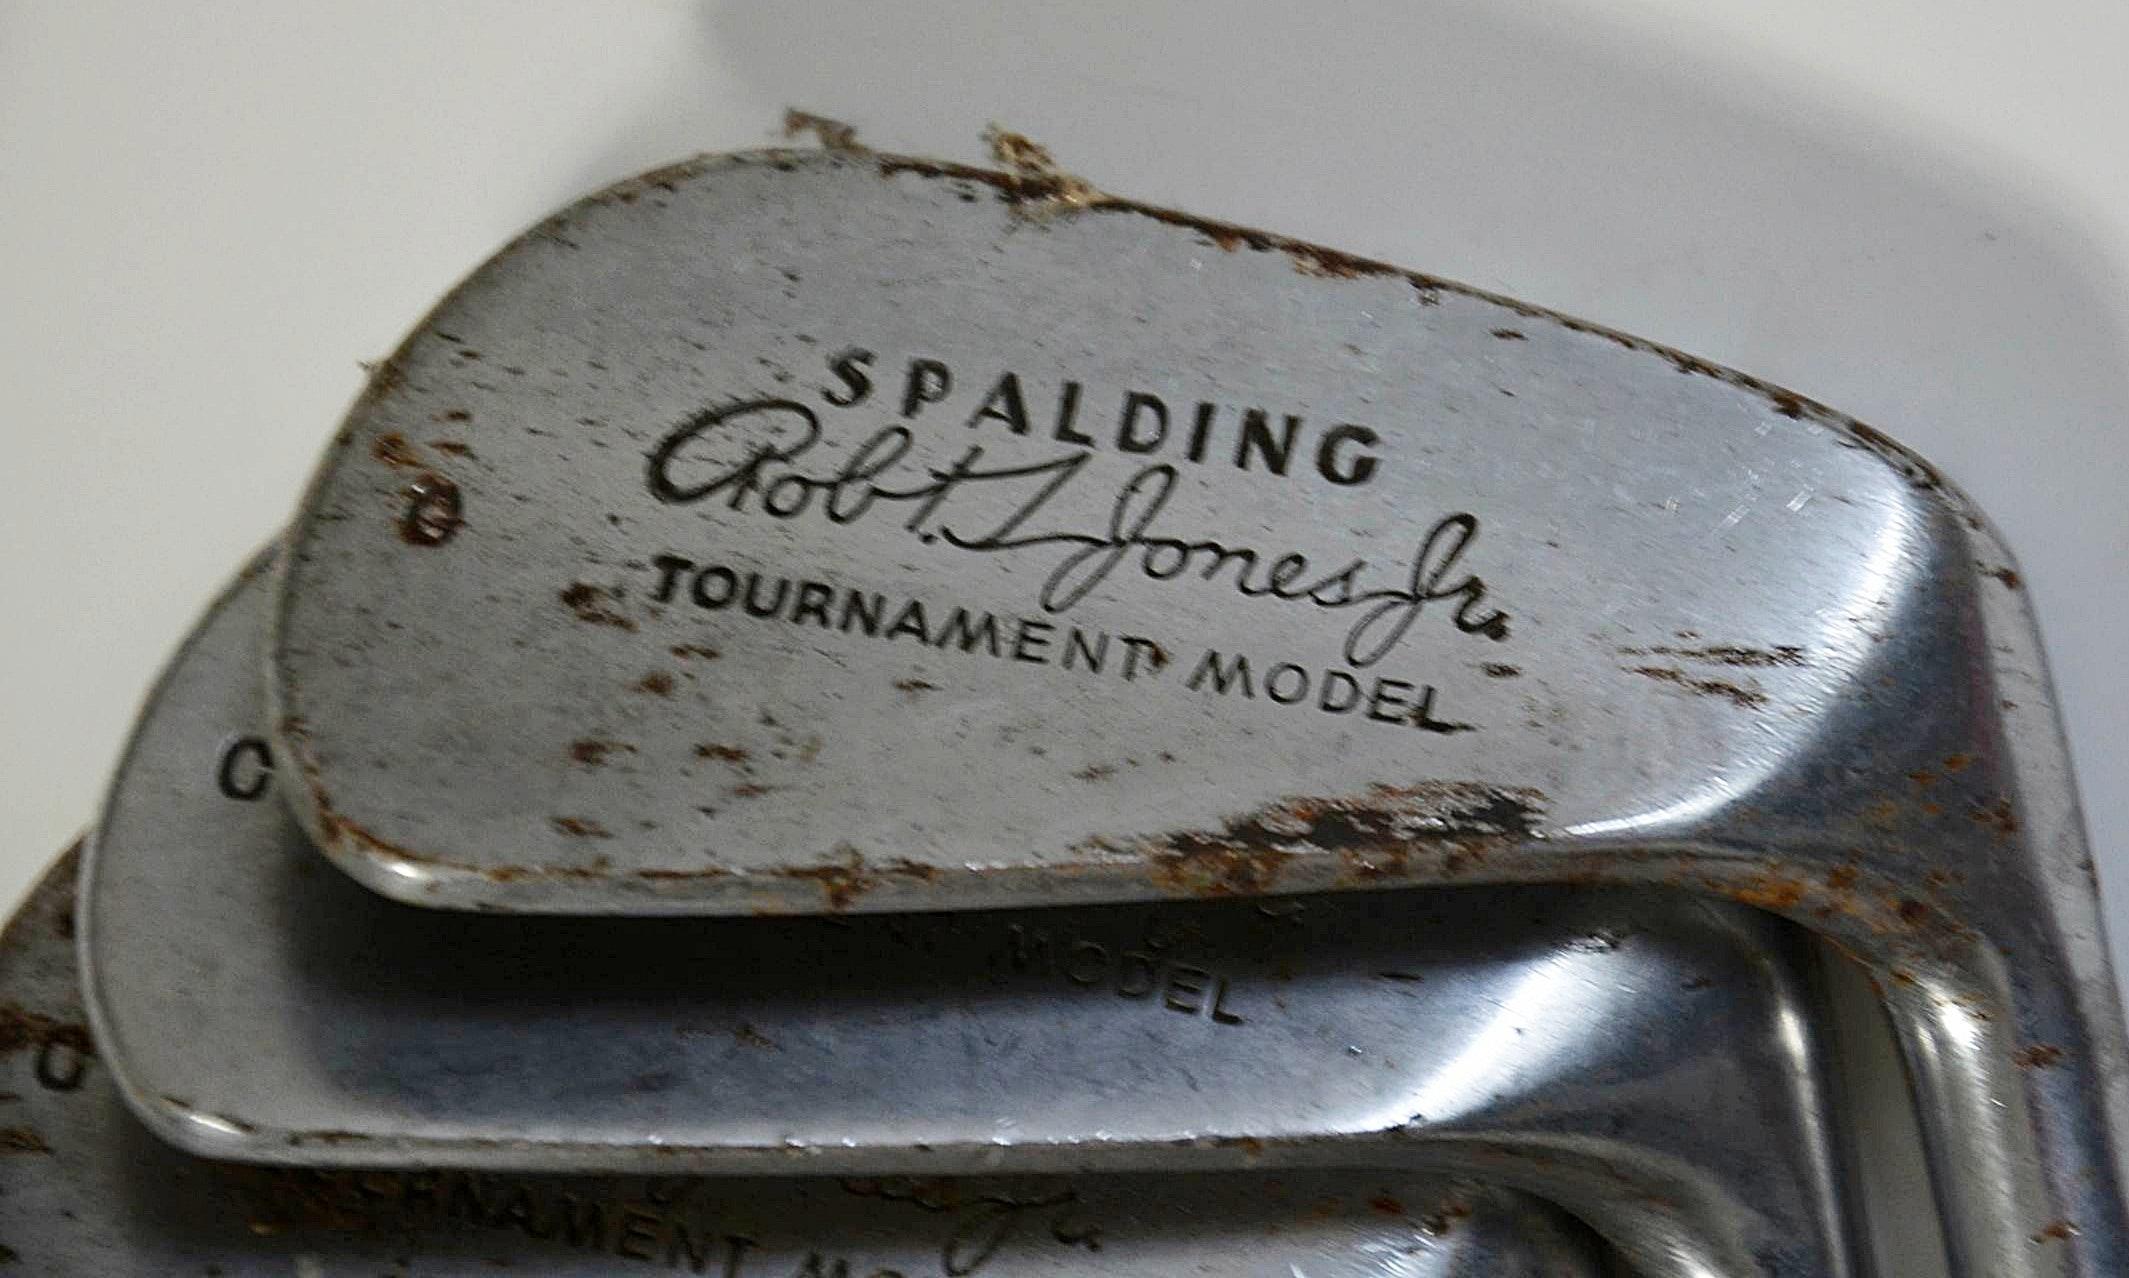 Circa 1950 S Spalding Robert T Jones Jr Golf Club Set